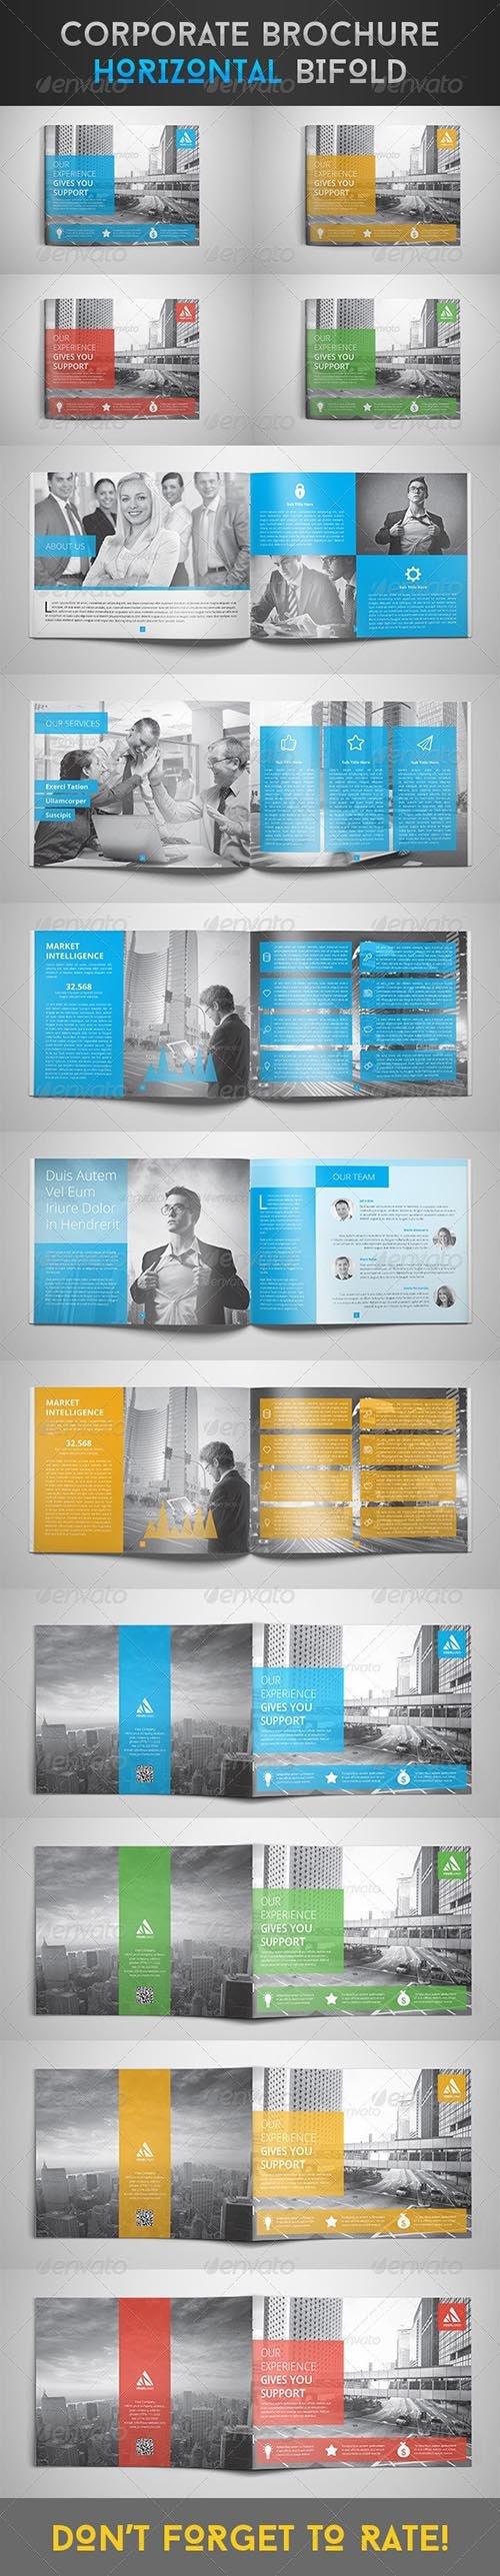 GR - Corporate Brochure - Horizontal Bi-Fold 8124753